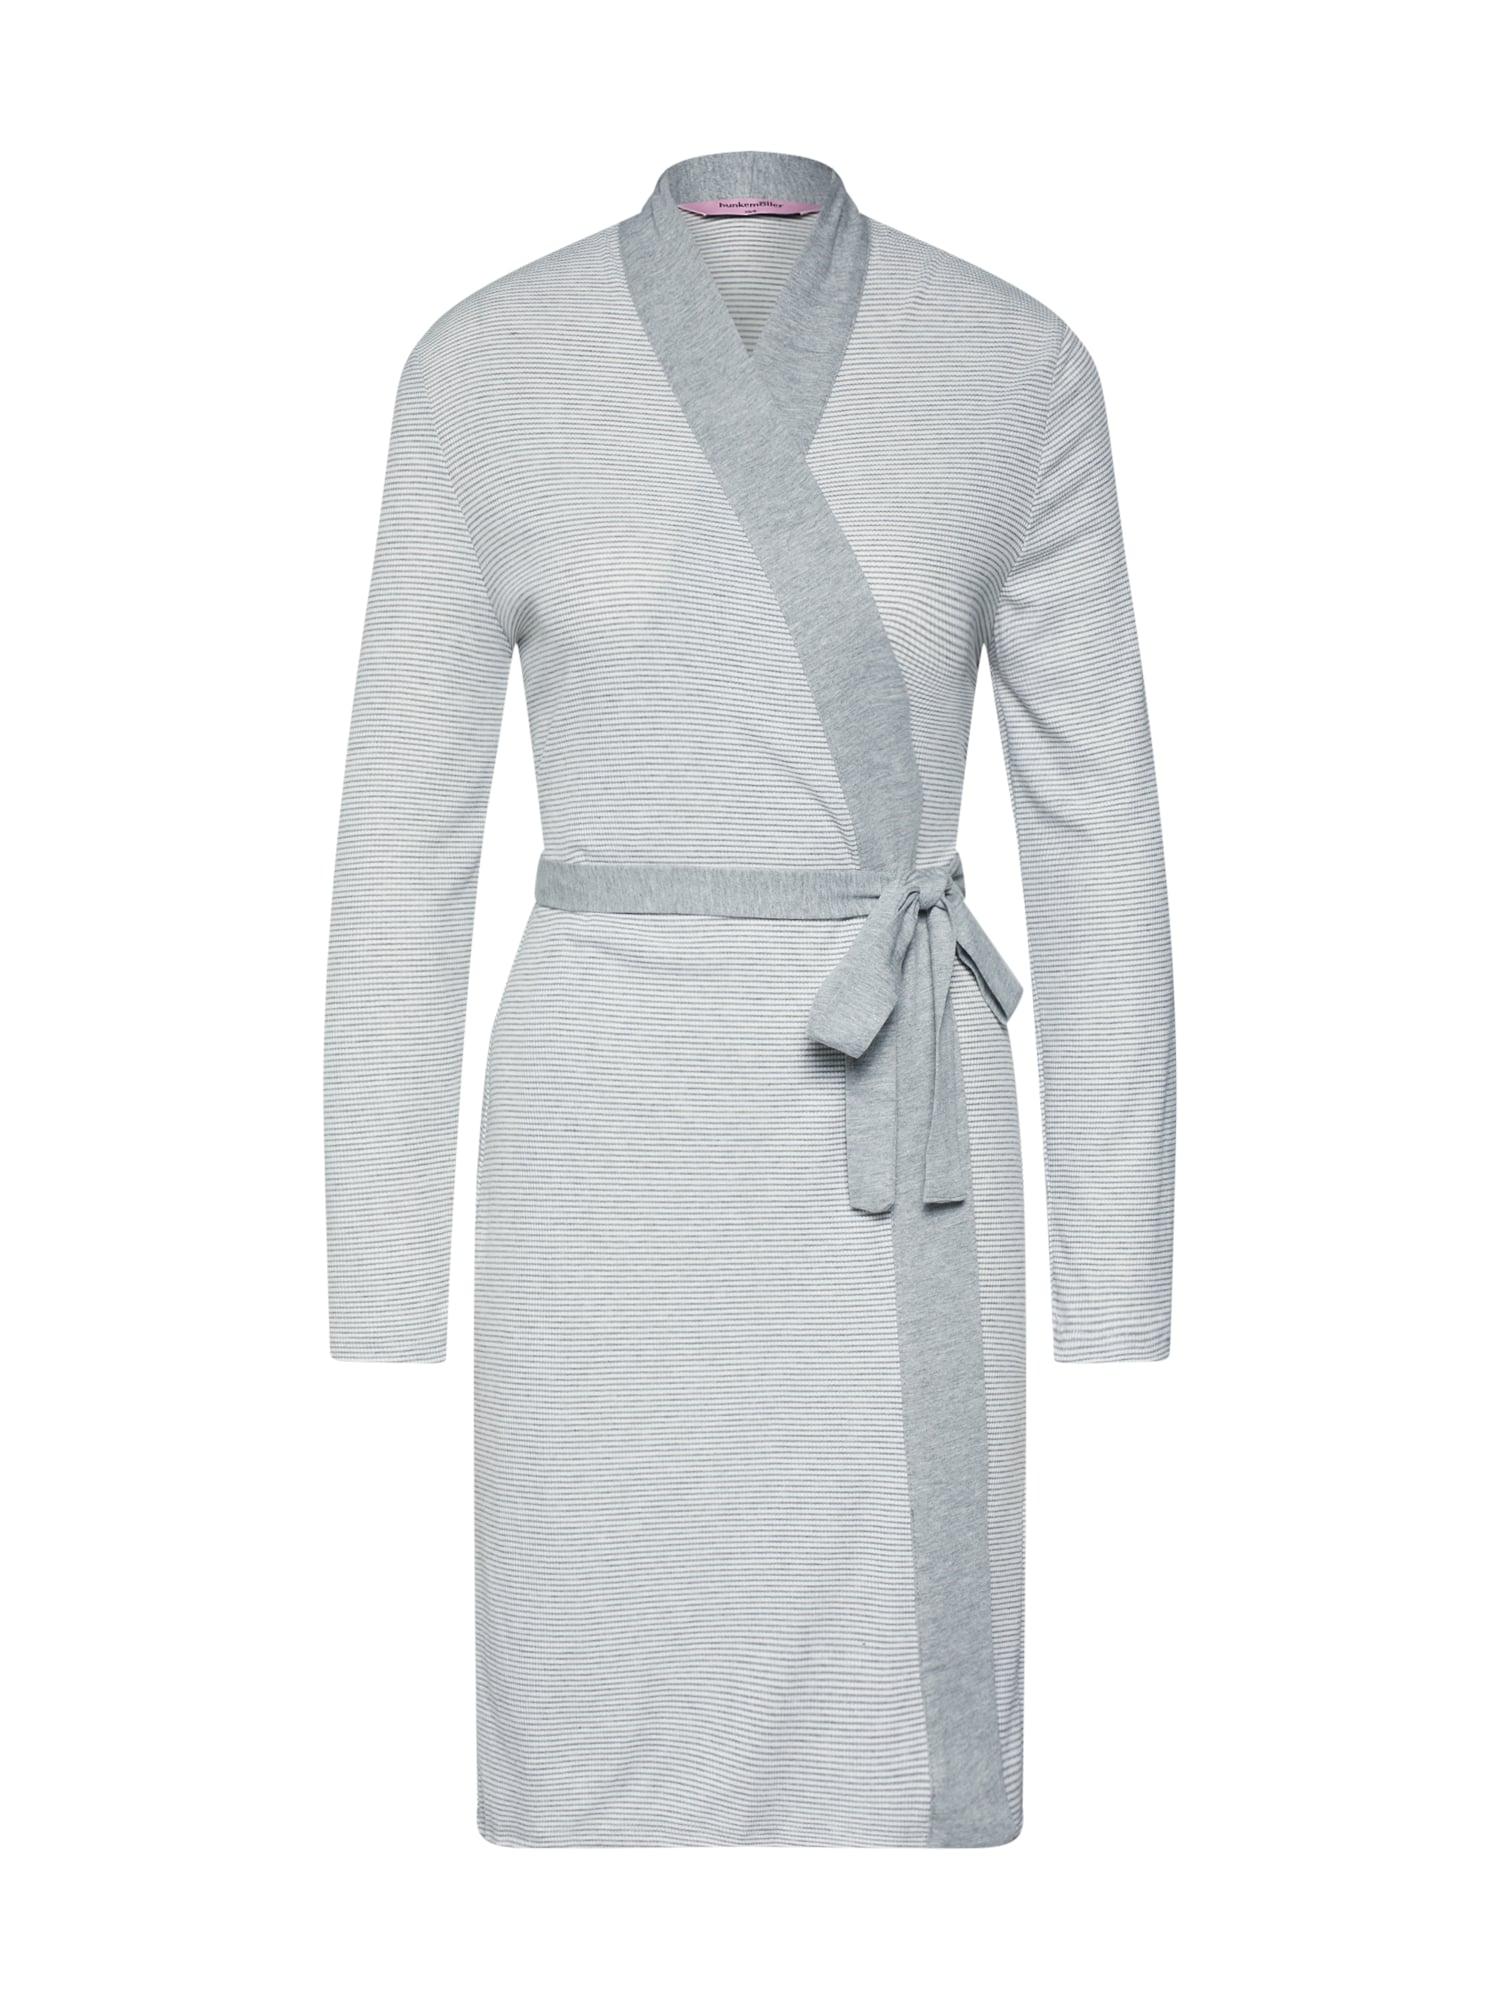 Morgenmantel 'Robe Jersey Rib' | Bekleidung > Homewear > Morgenmäntel | Grau | Hunkemöller